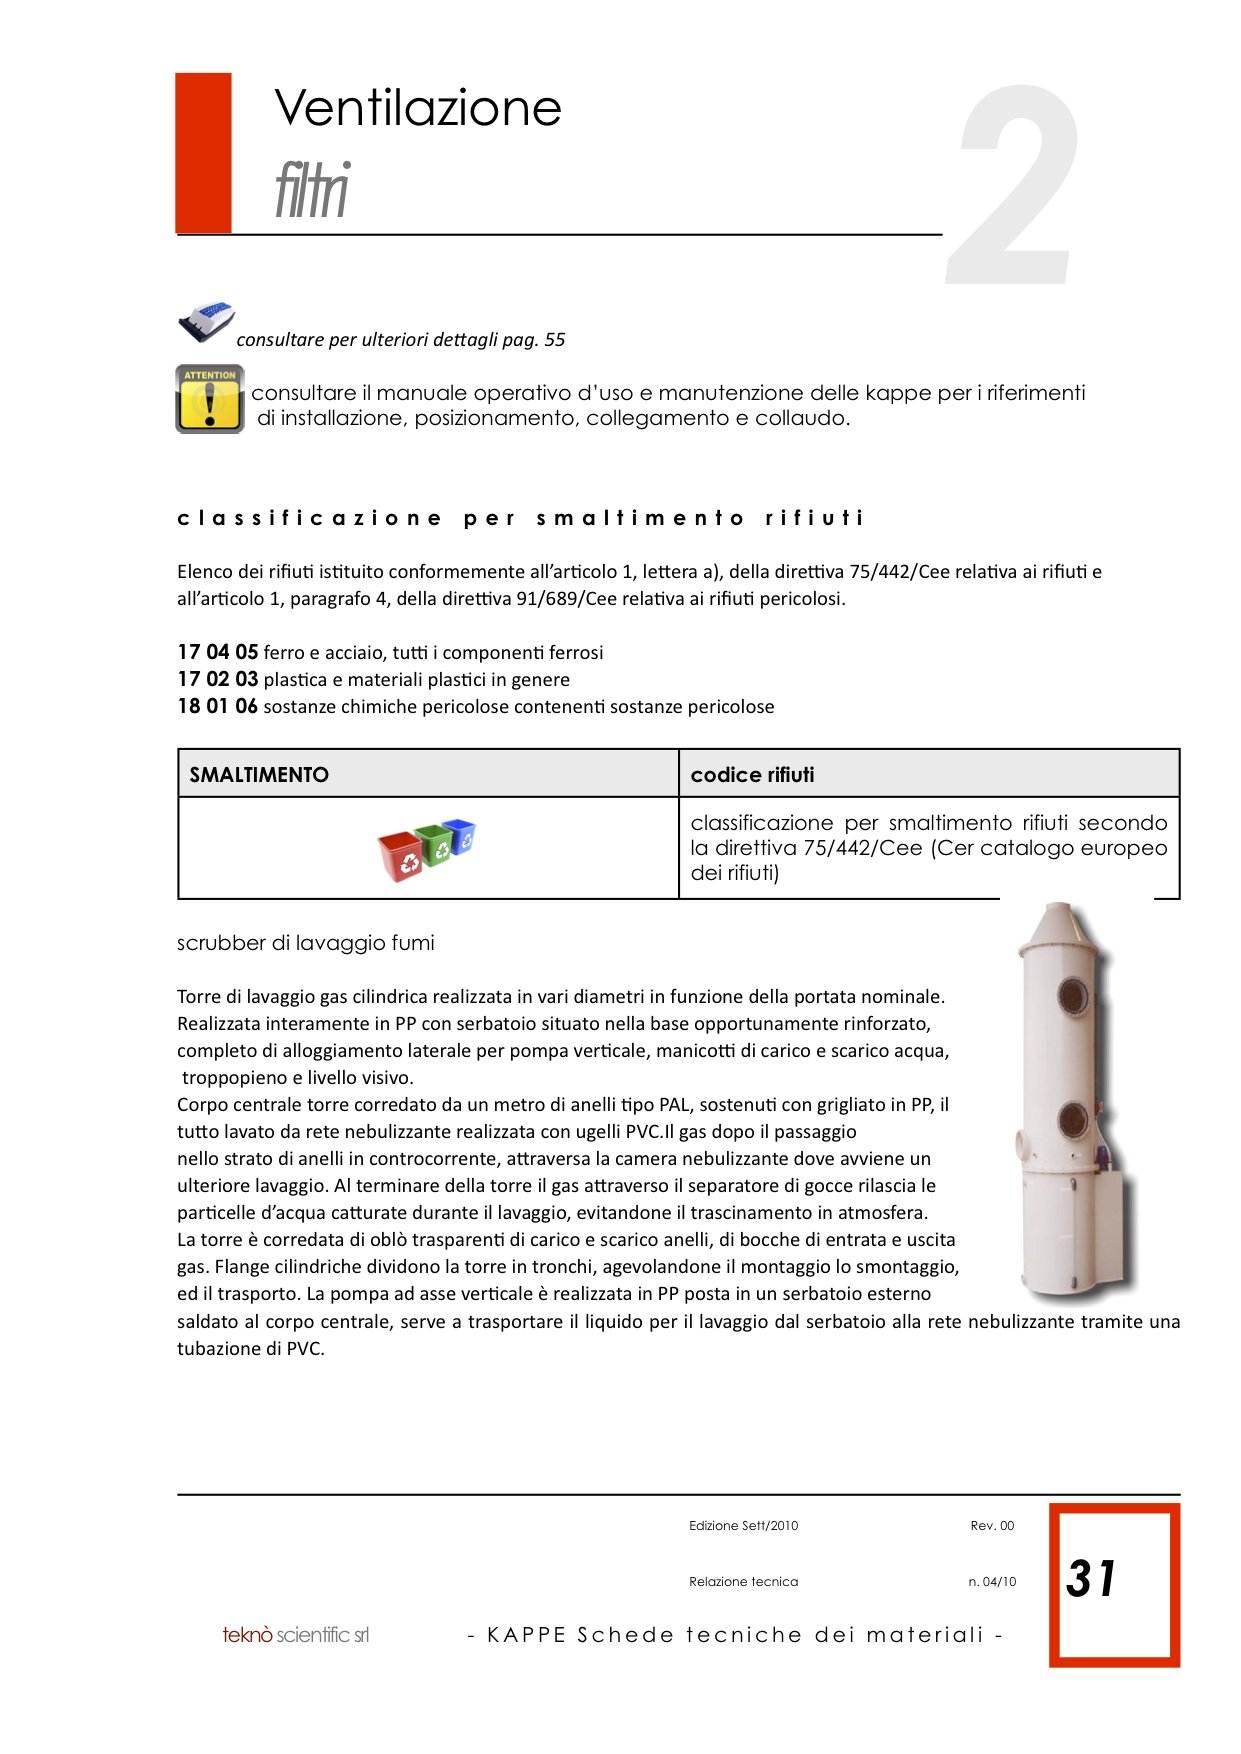 KAPPE Schede tecniche materiali copia 11.png